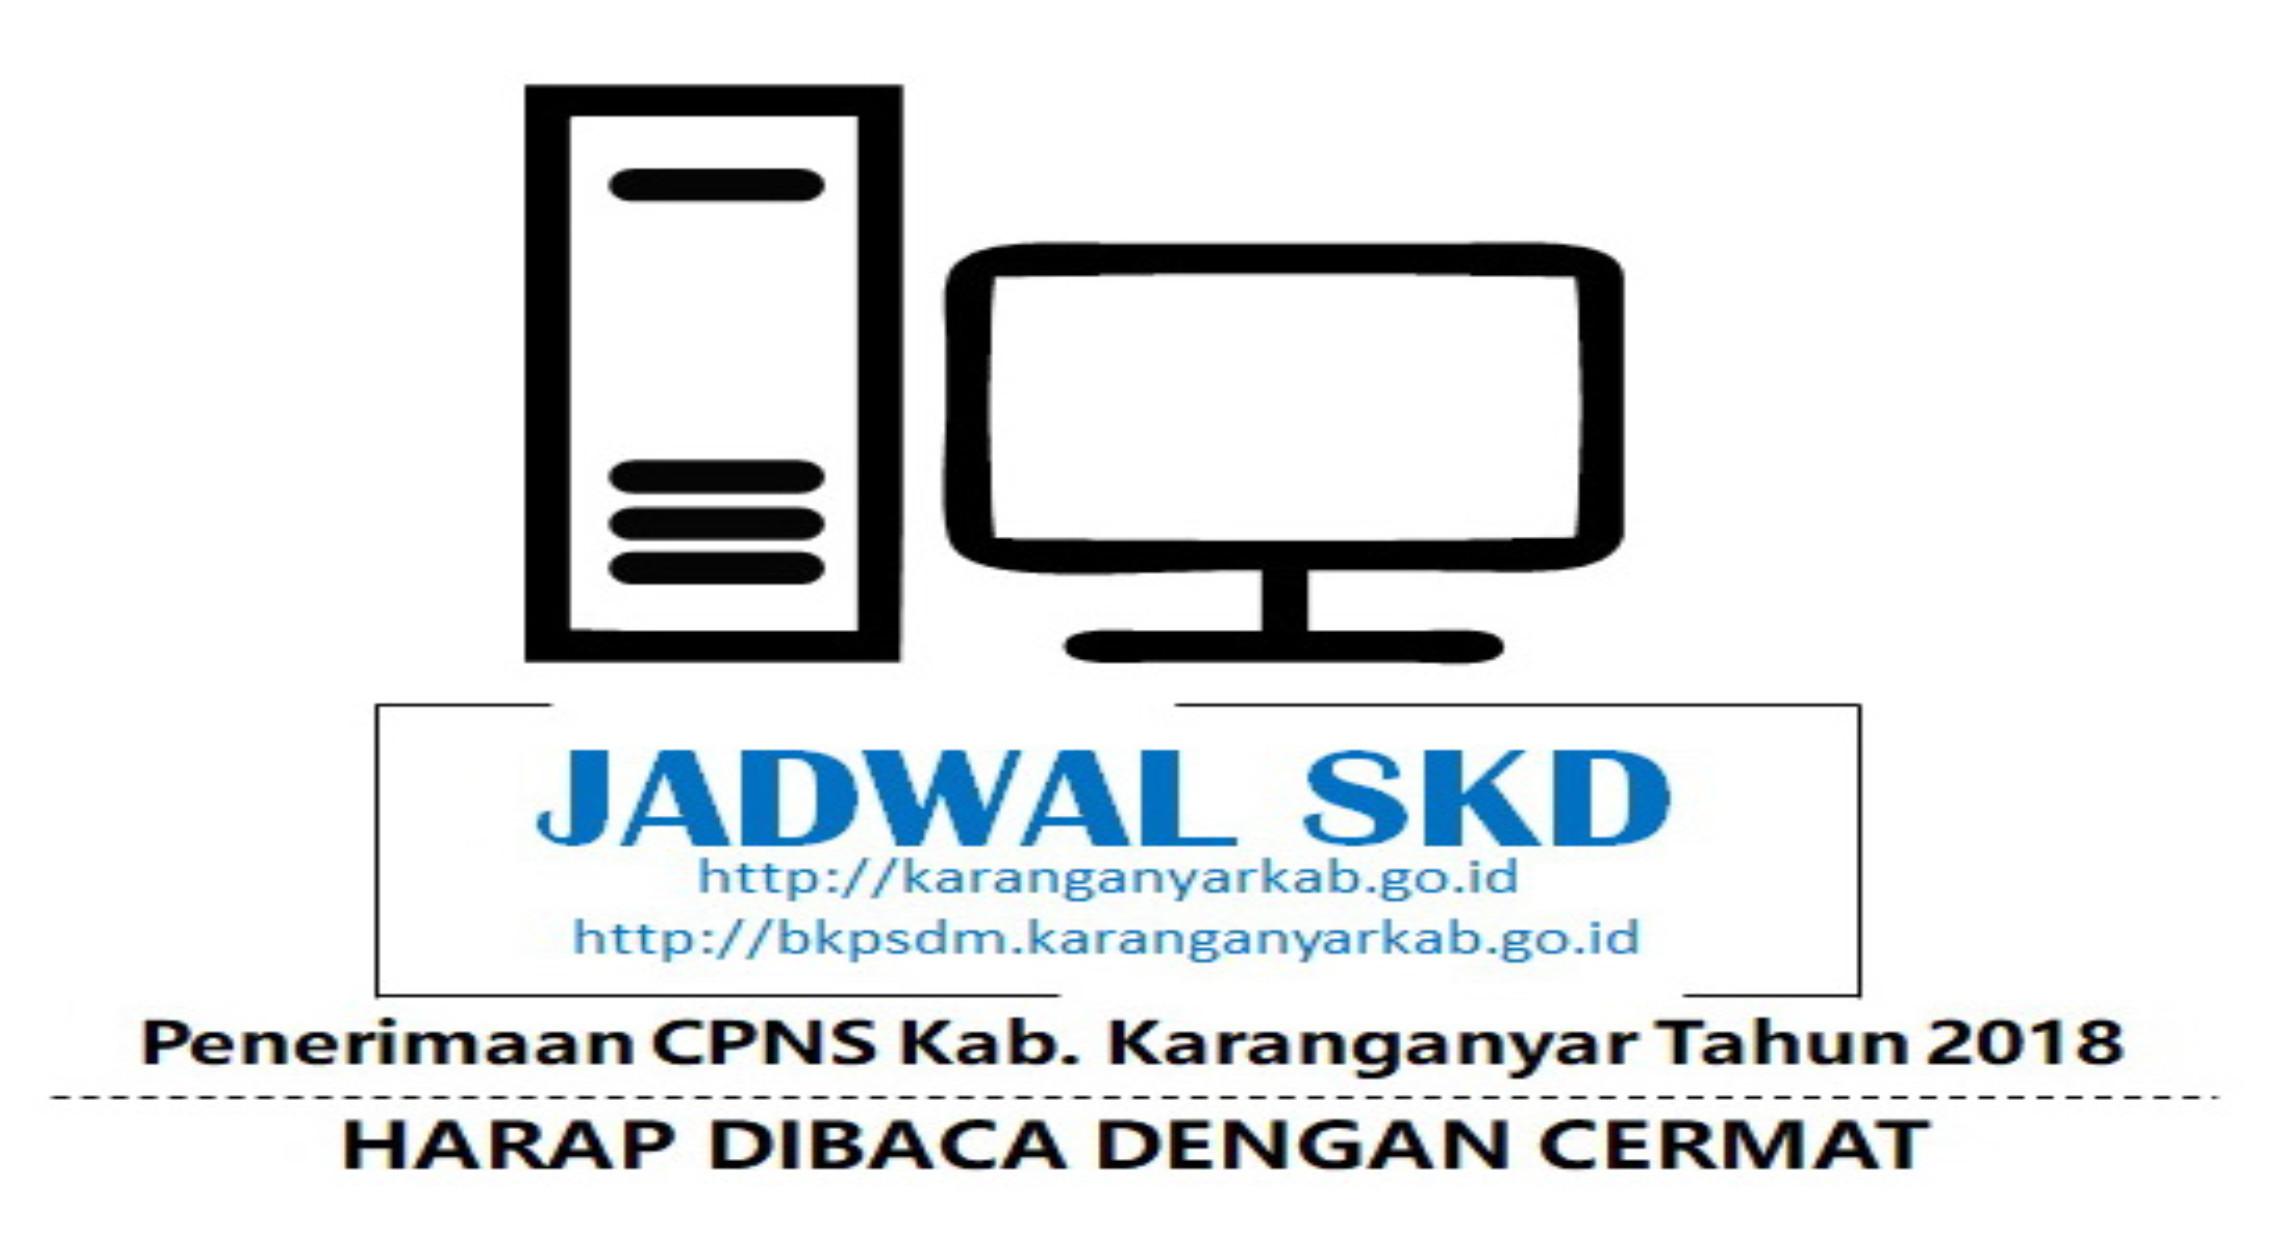 Pengumuman Jadwal Tes SKD dan Pembagian Sesi CPNS Kab. Karanganyar